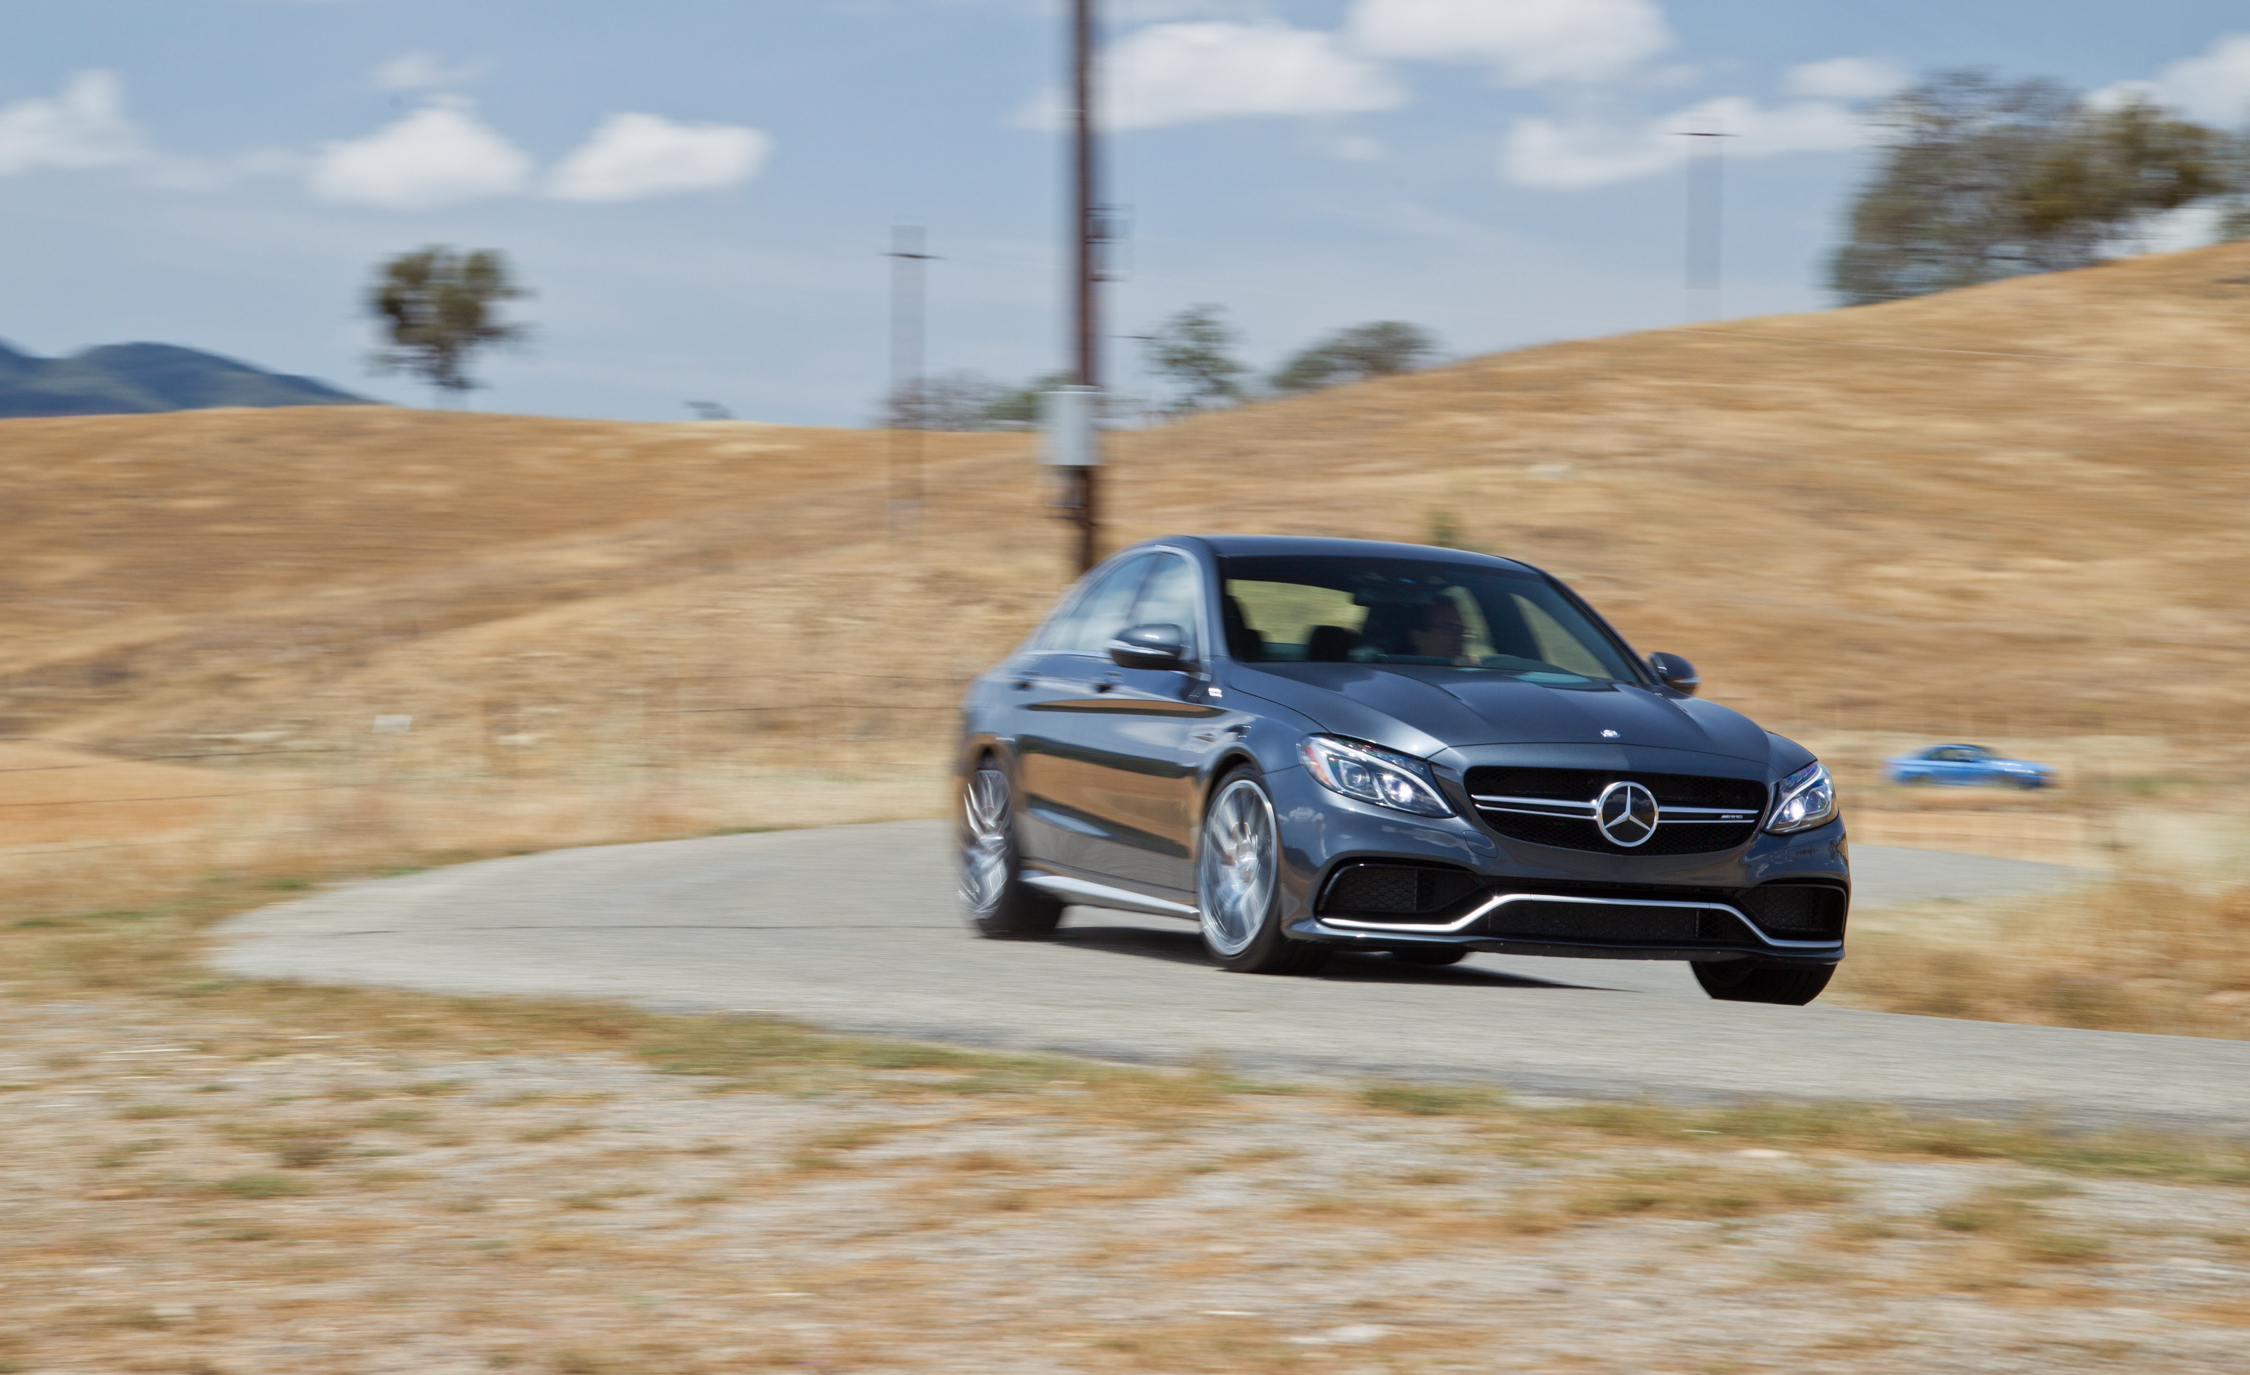 2015 Mercedes-AMG C63 S-Model Front Side Exterior